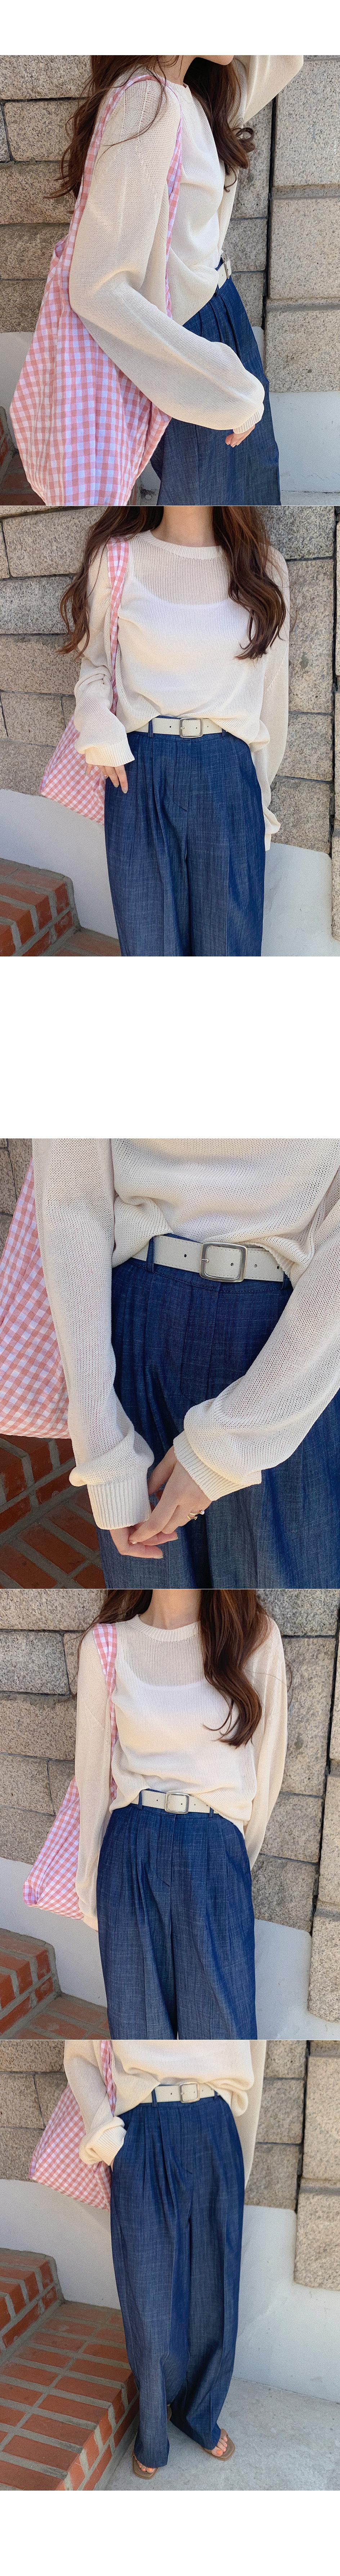 Polmare Holga Round Knitwear